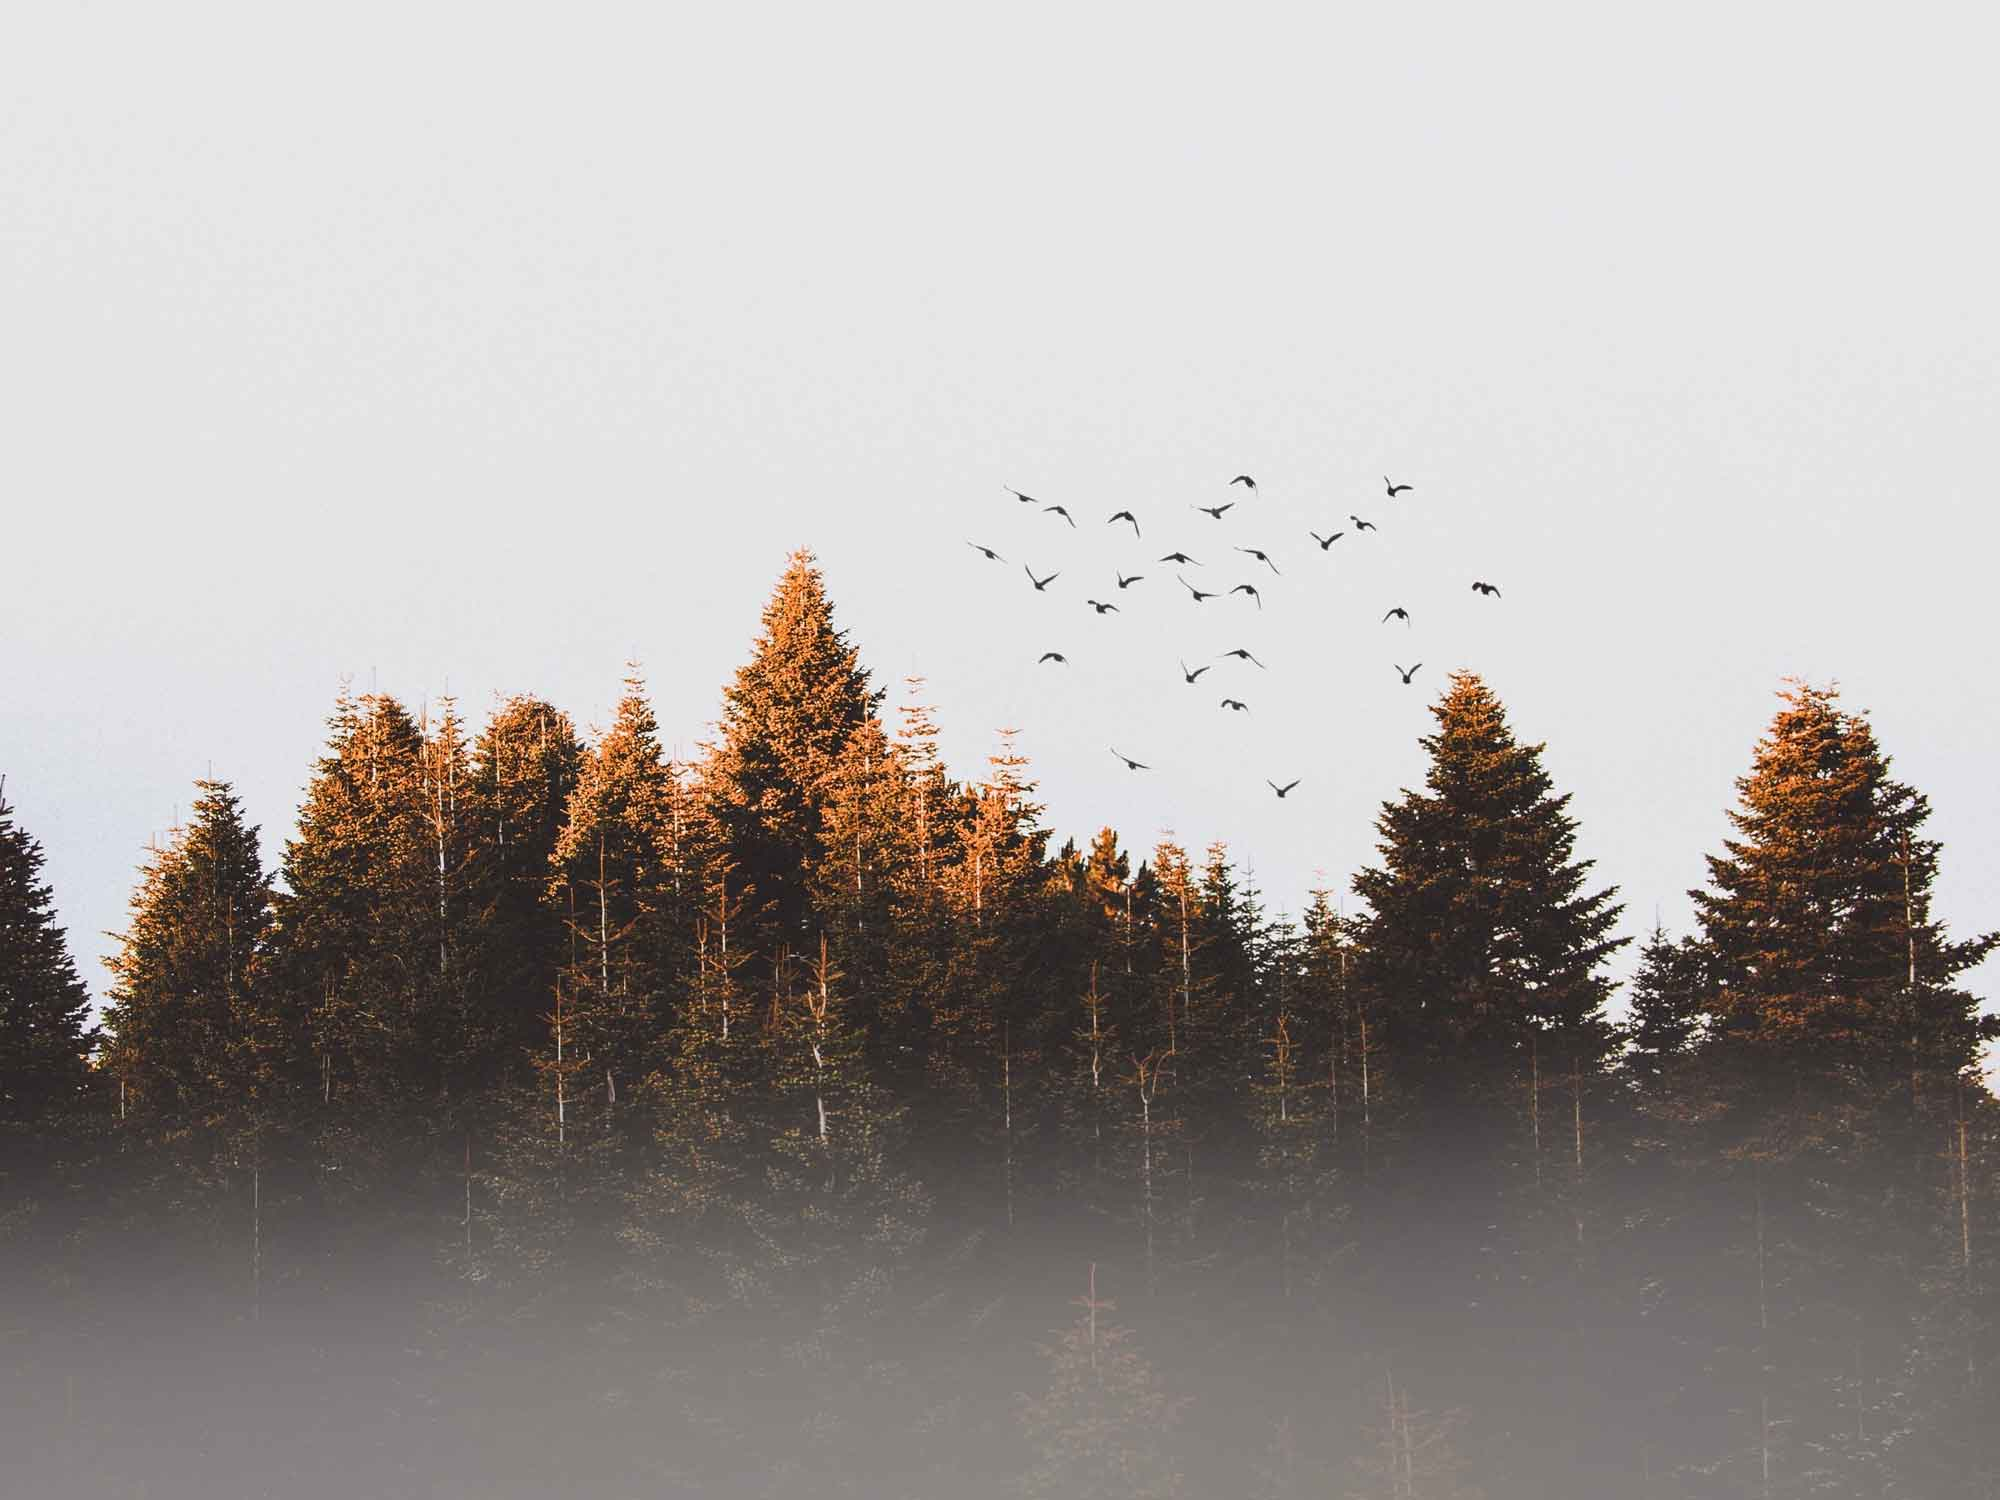 Inspiration_Natur_Styling_ideen_Wald_Vogelschwarm_am_Himmel